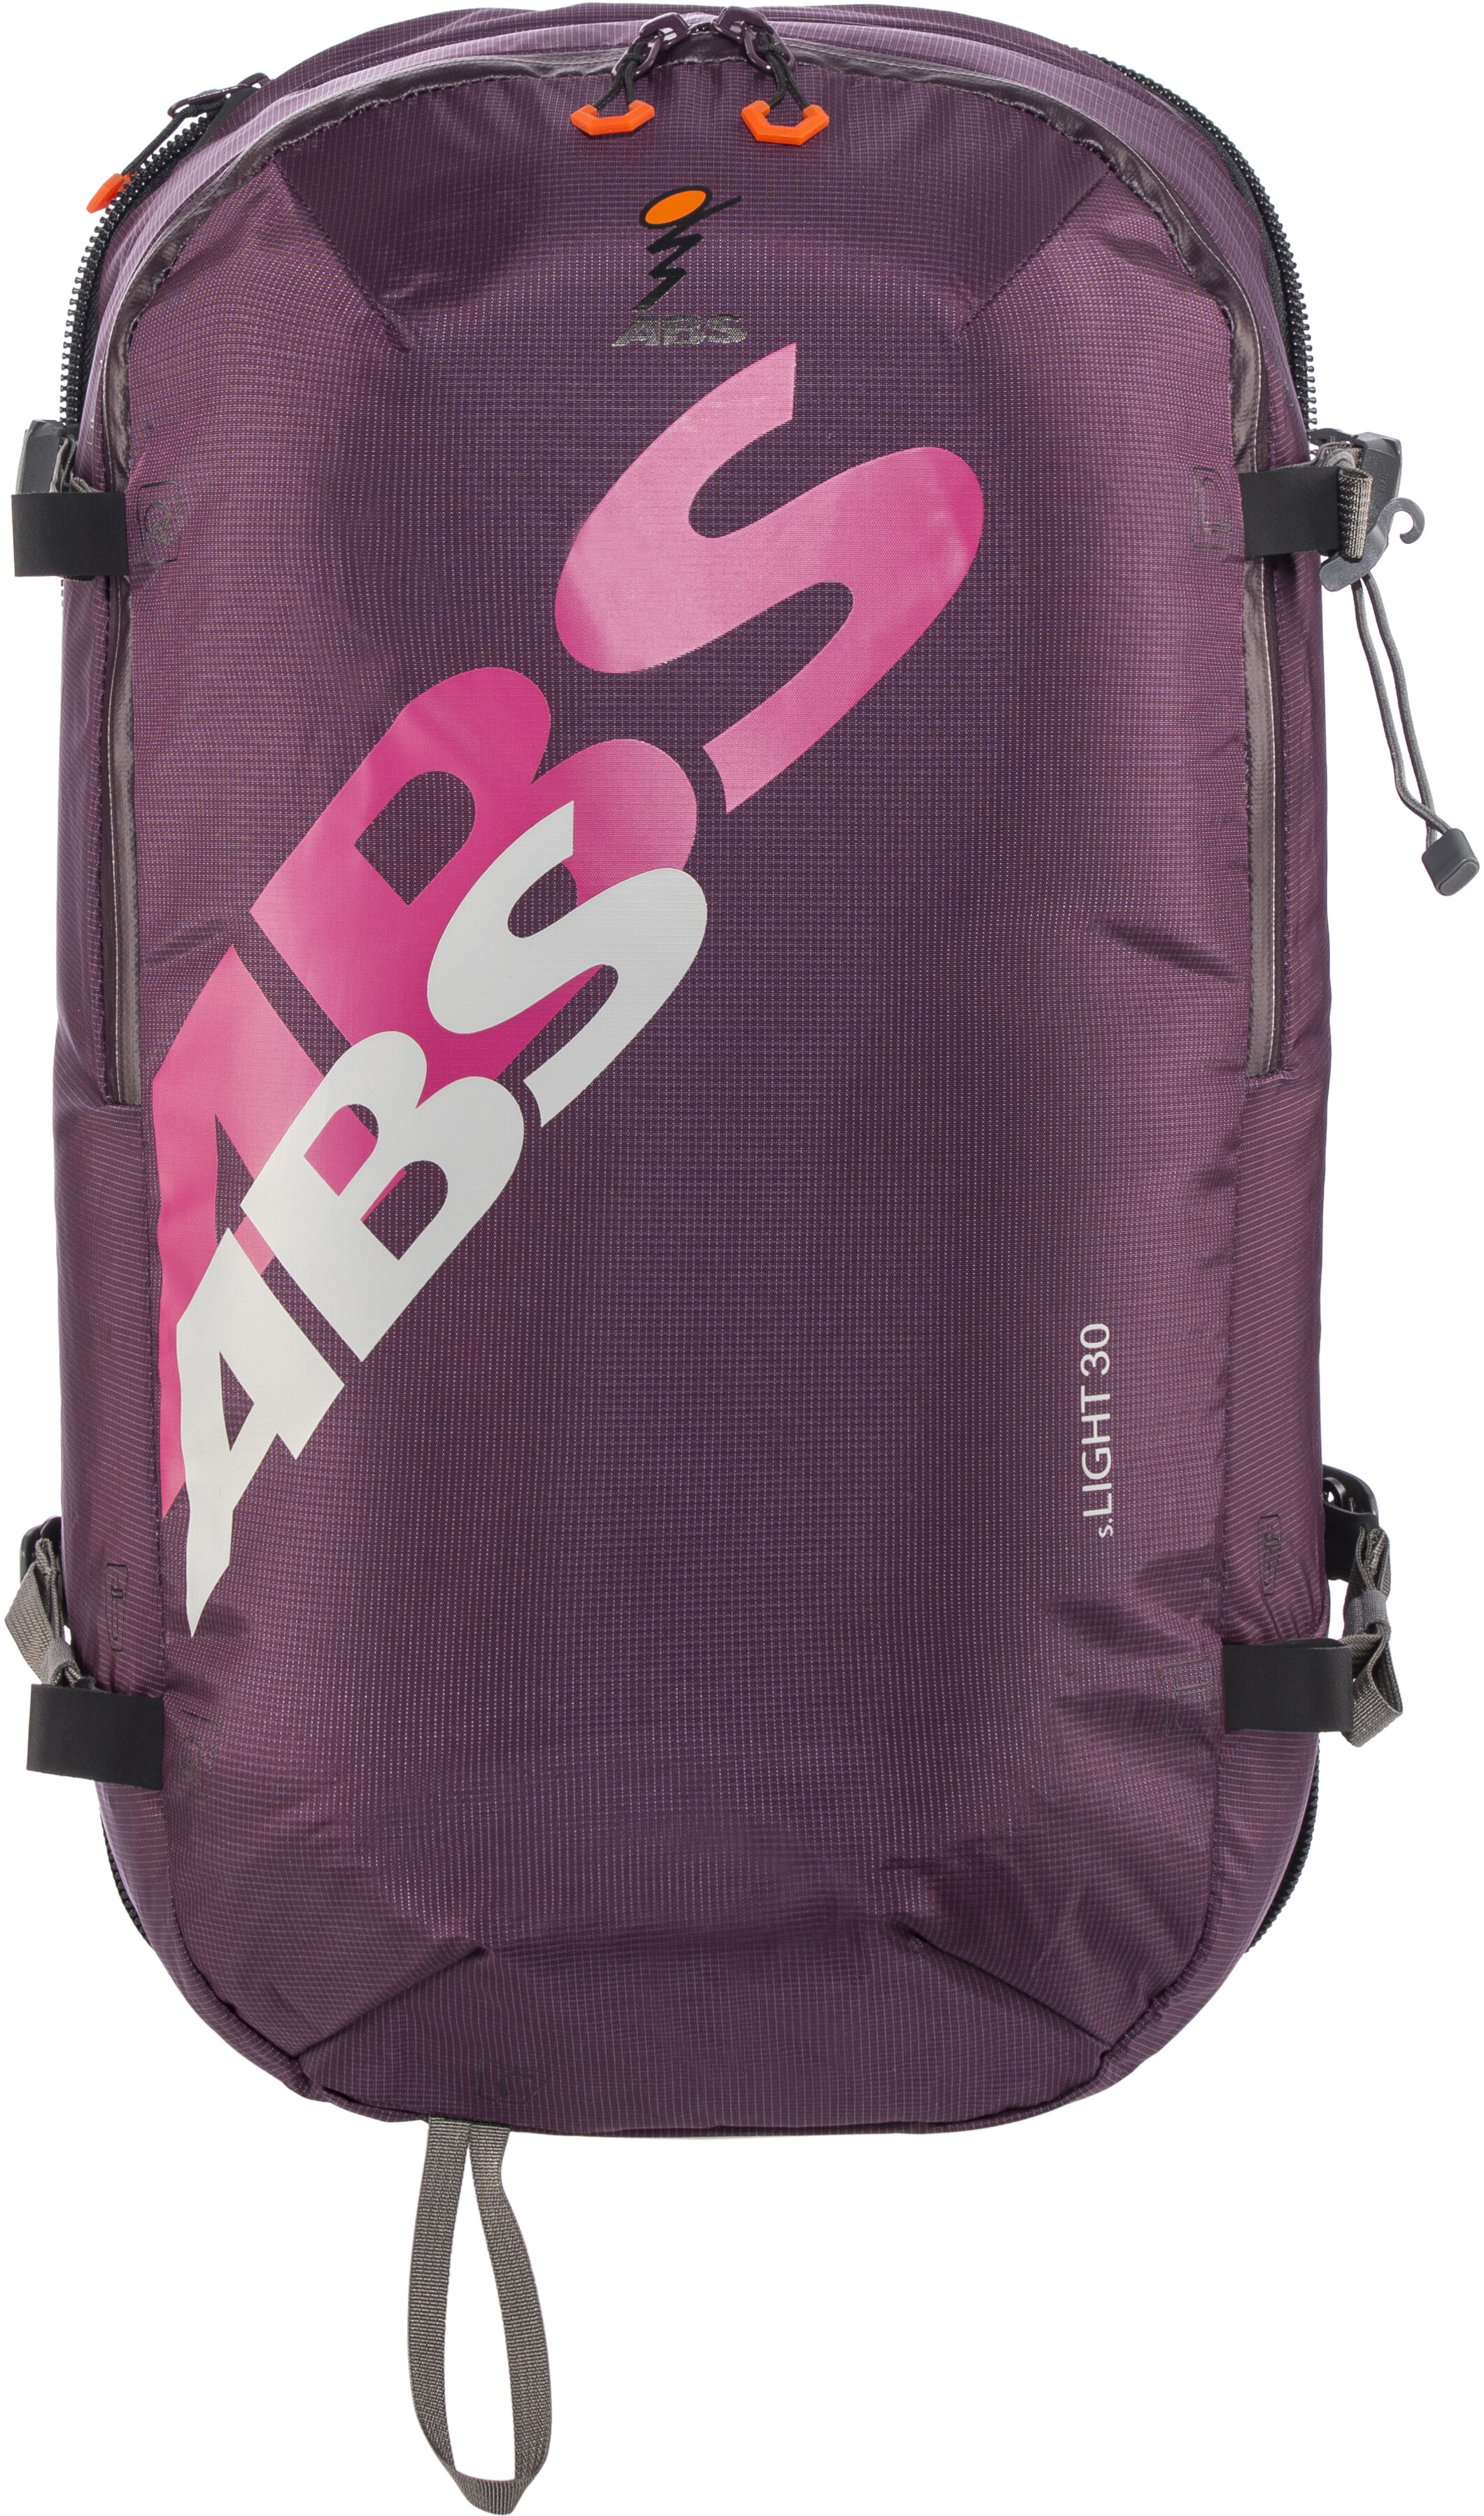 0a9d358317 ABS s.LIGHT Compact Zaino airbag 30l viola su Addnature